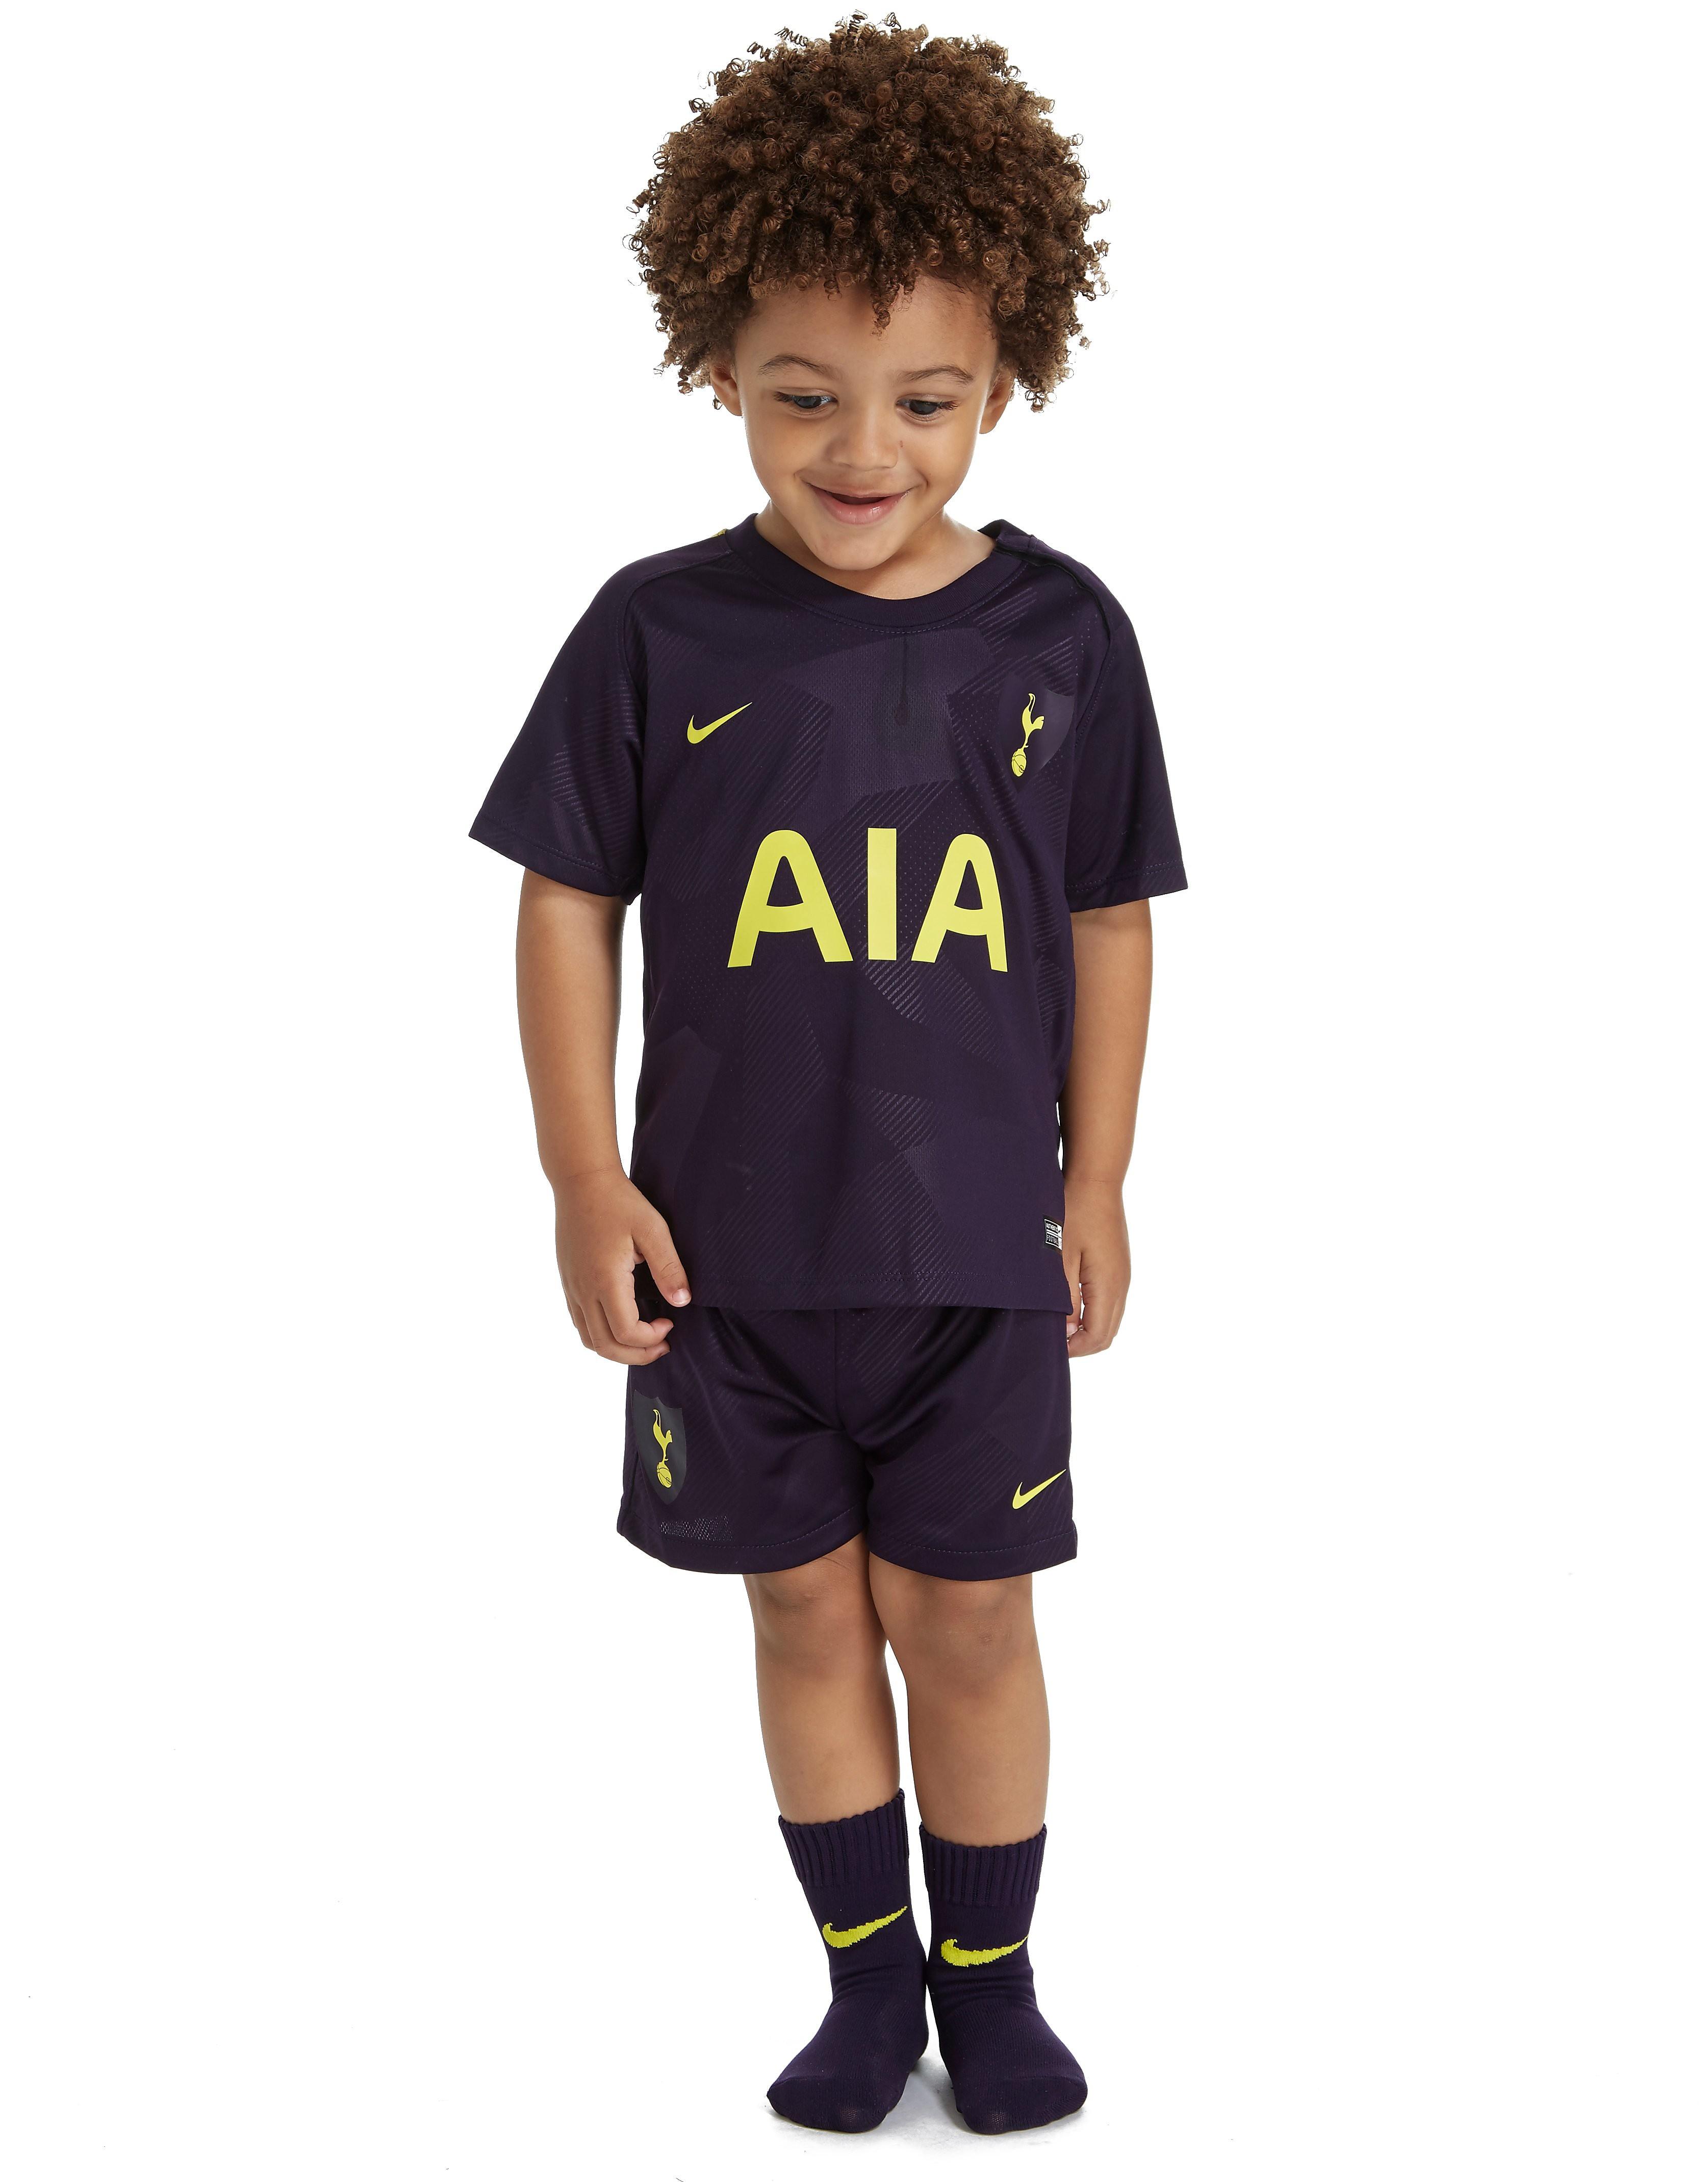 Nike Tottenham Hotspur FC 2017/18 Drittes Kit Kleinkind